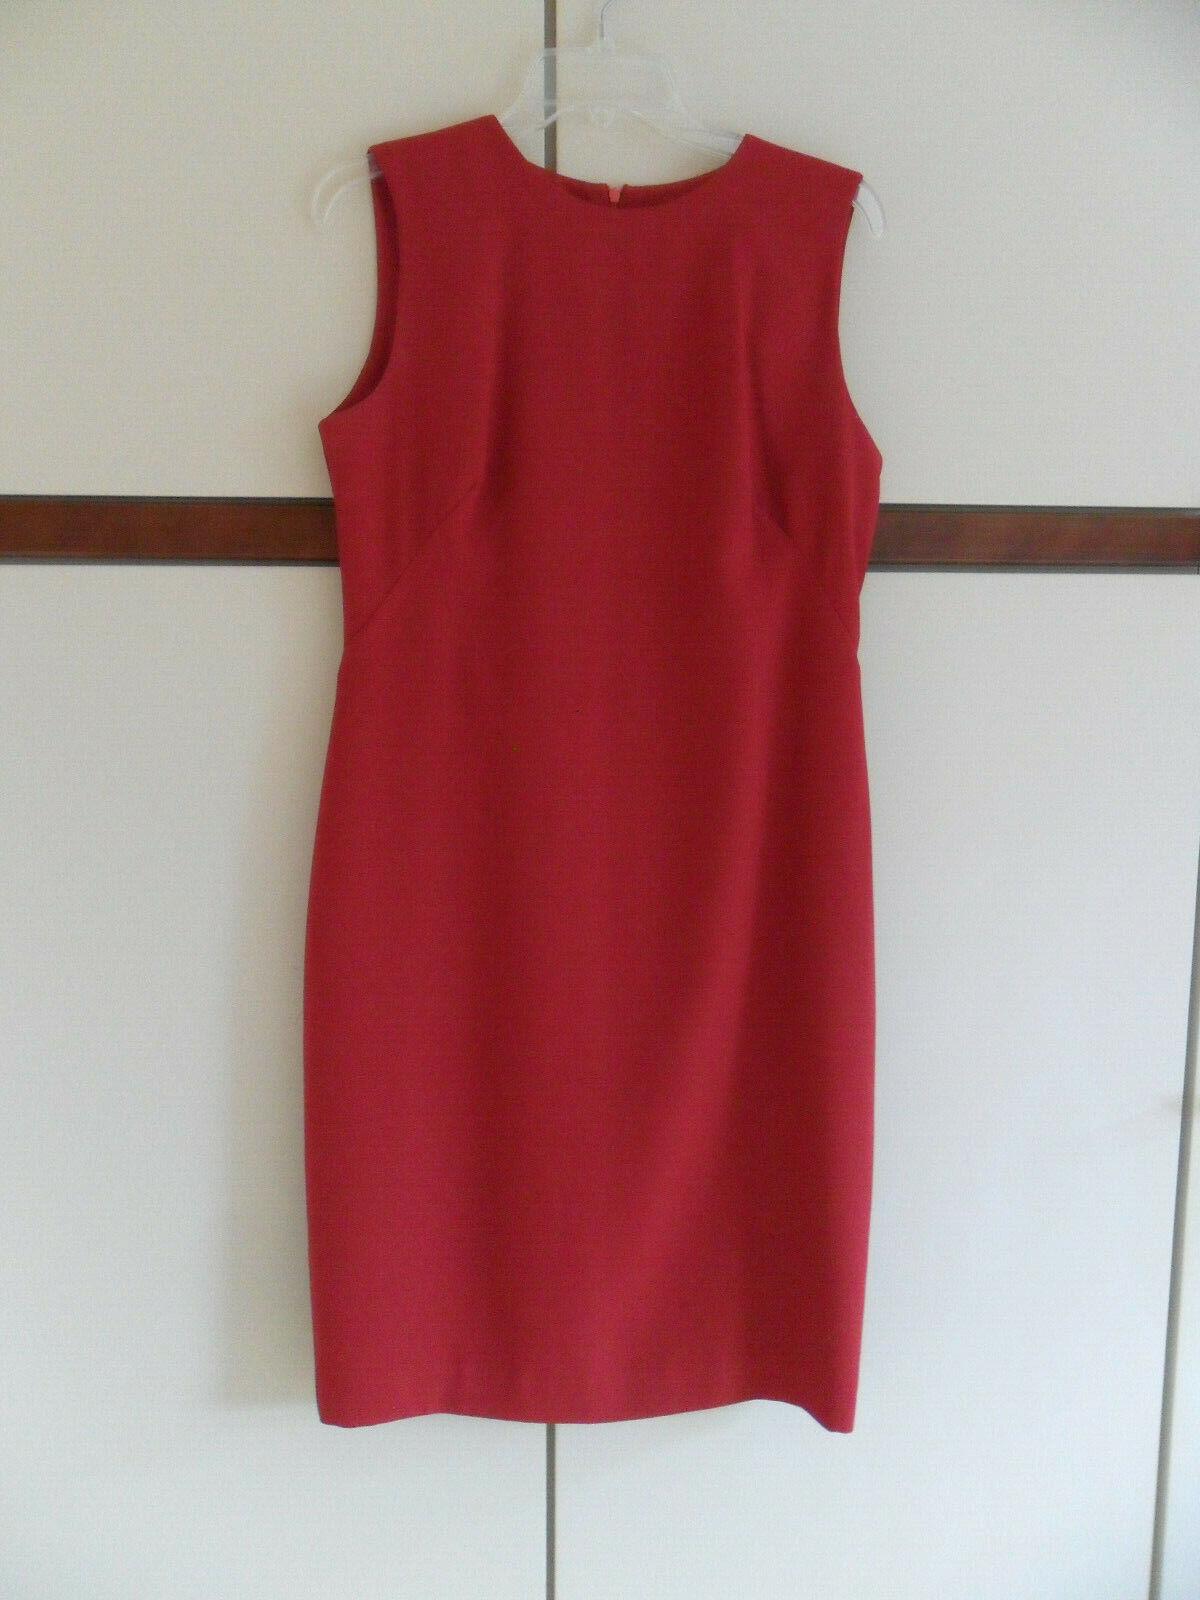 Etuikleid mit Gehrock Damenkleid mit Mantel rot Gr. 38